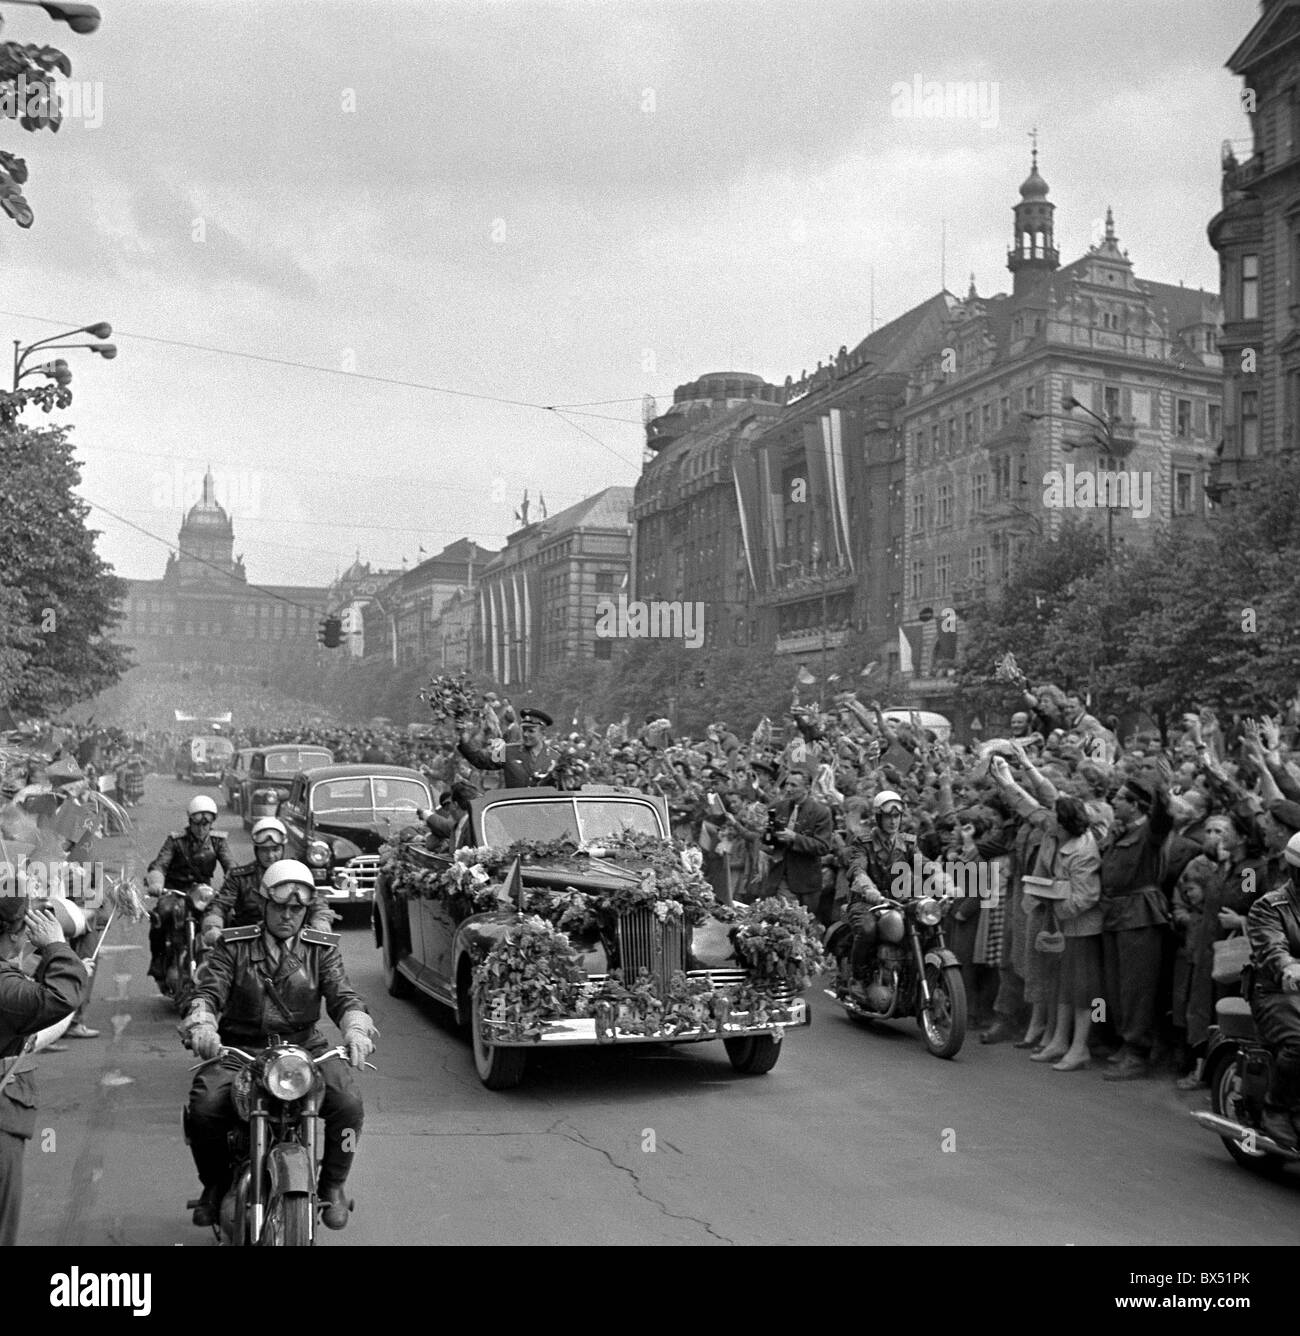 cosmonaut Yuri Gagarin, car, motorcade,Wenceslas Square - Stock Image